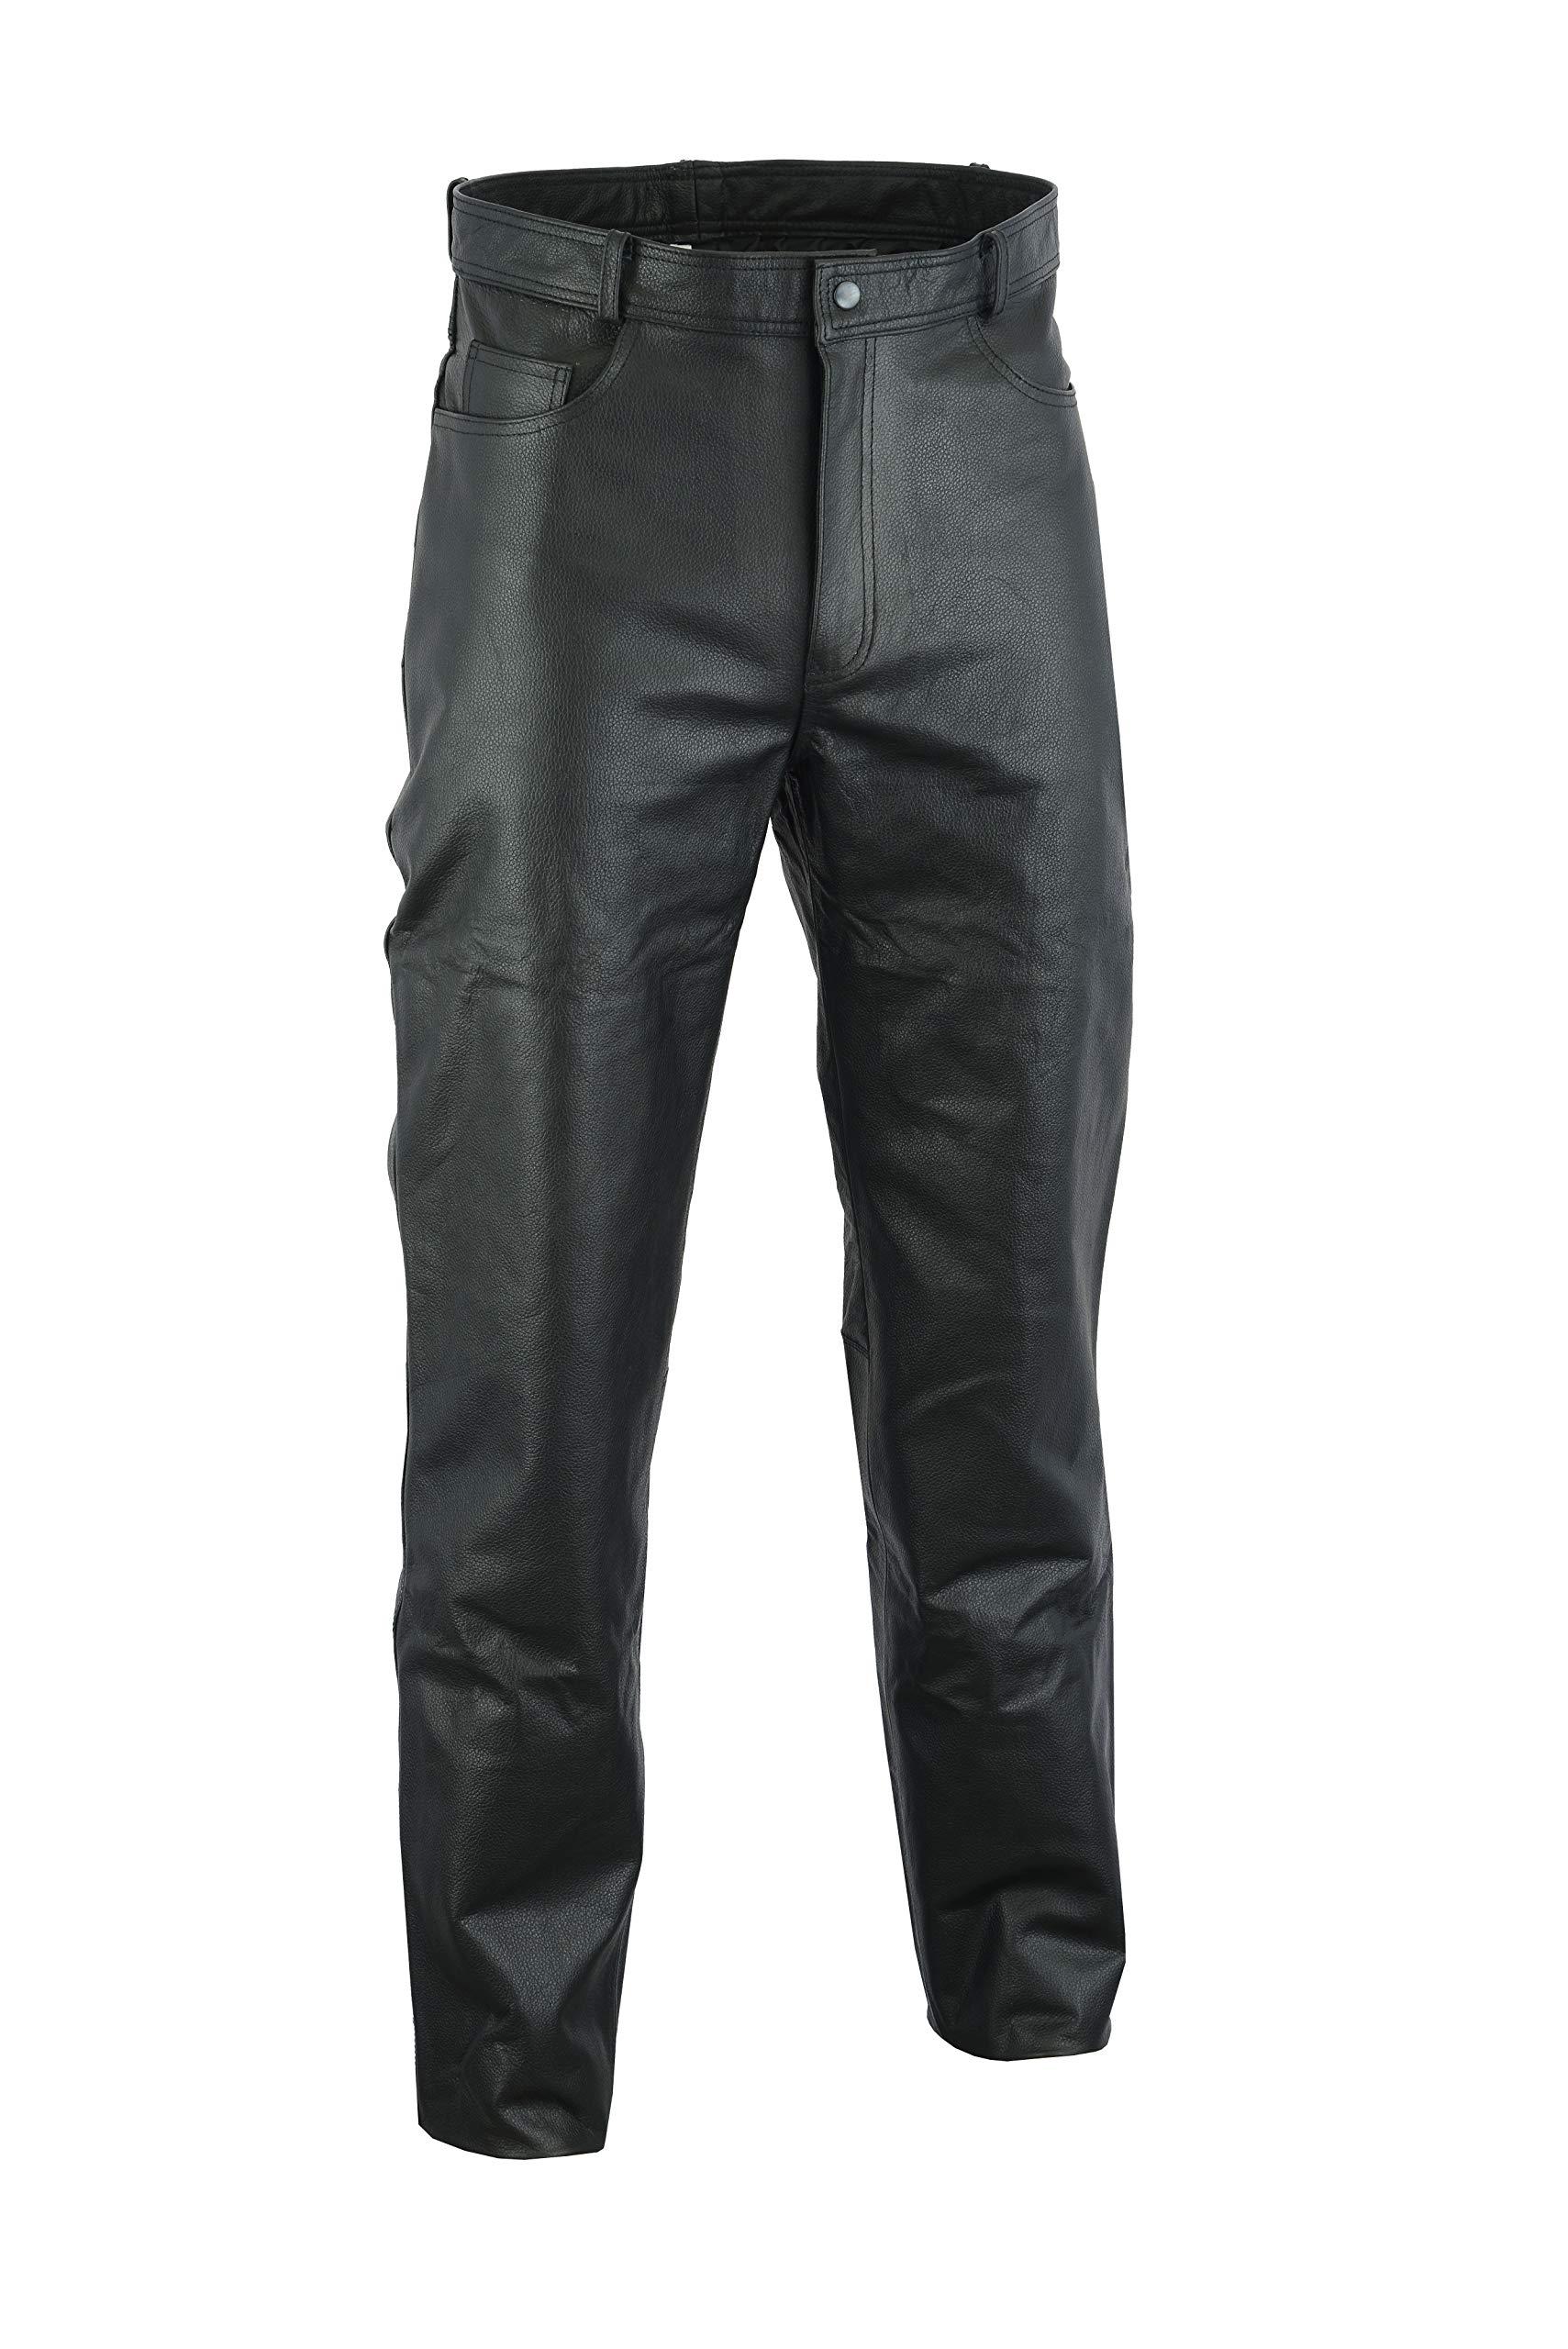 968b15545495b Ruja Mens Genuine Leather Black Pants (32 W)